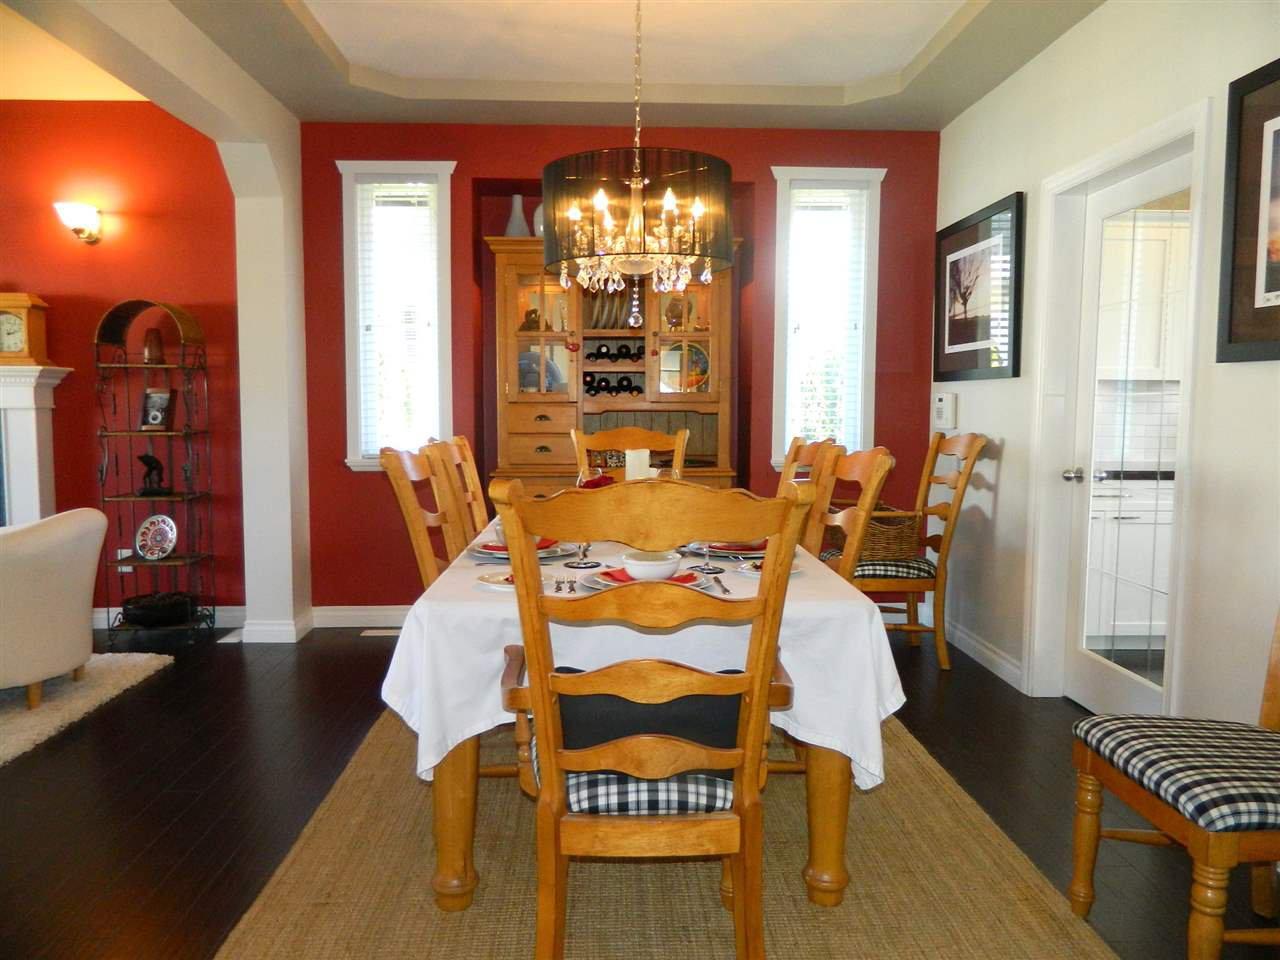 Photo 5: Photos: 24332 104 AVENUE in Maple Ridge: Albion House for sale : MLS®# R2051414